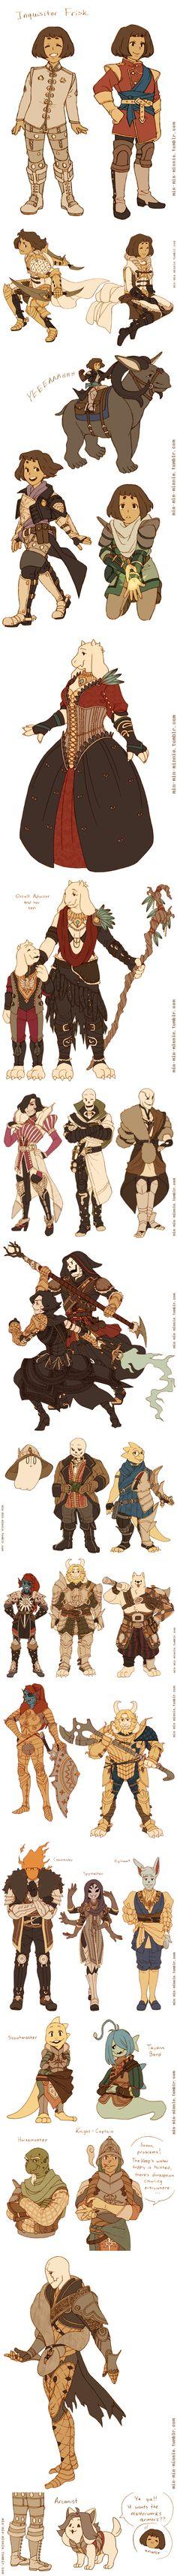 Undertale - Dragon Age #AU